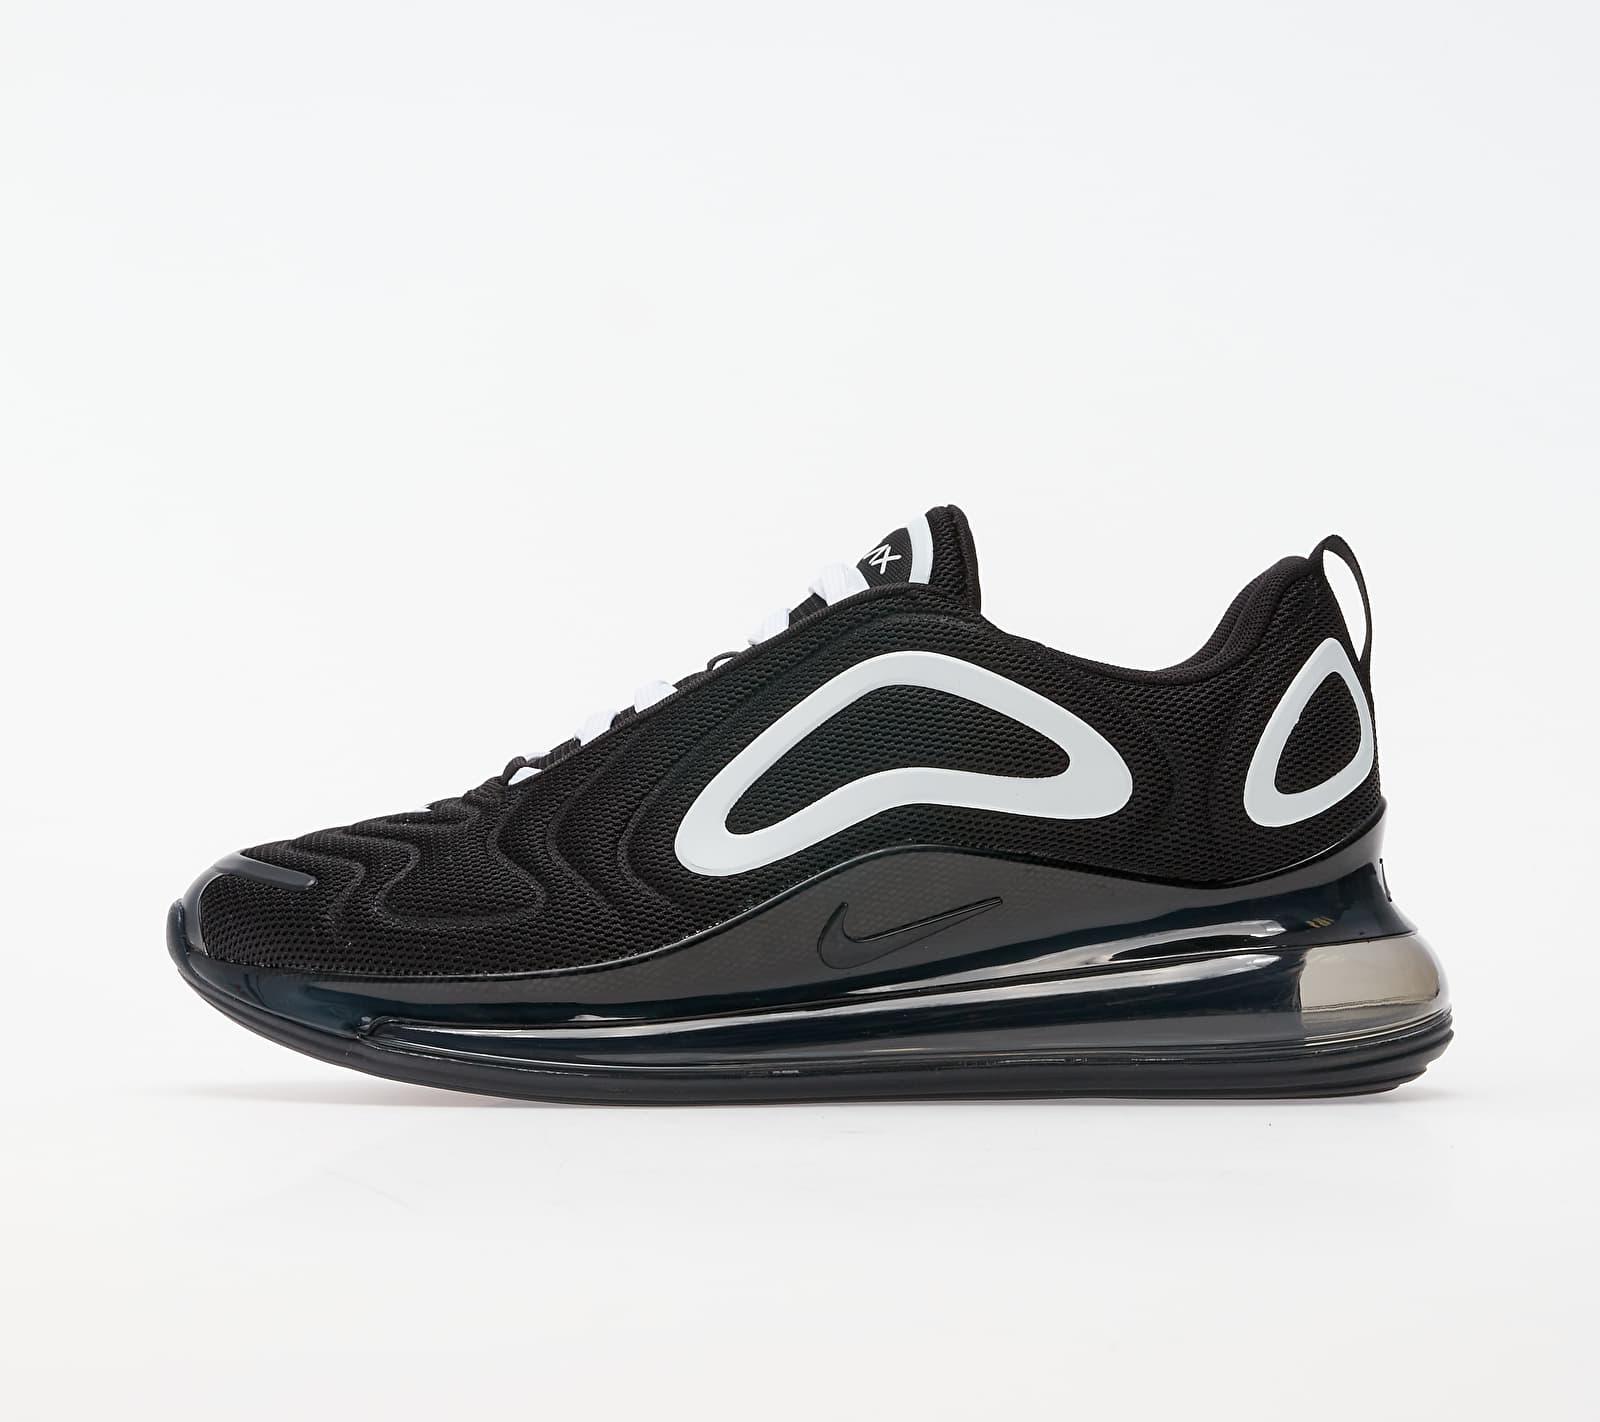 Nike Air Max 720 Black/ White-Anthracite EUR 39